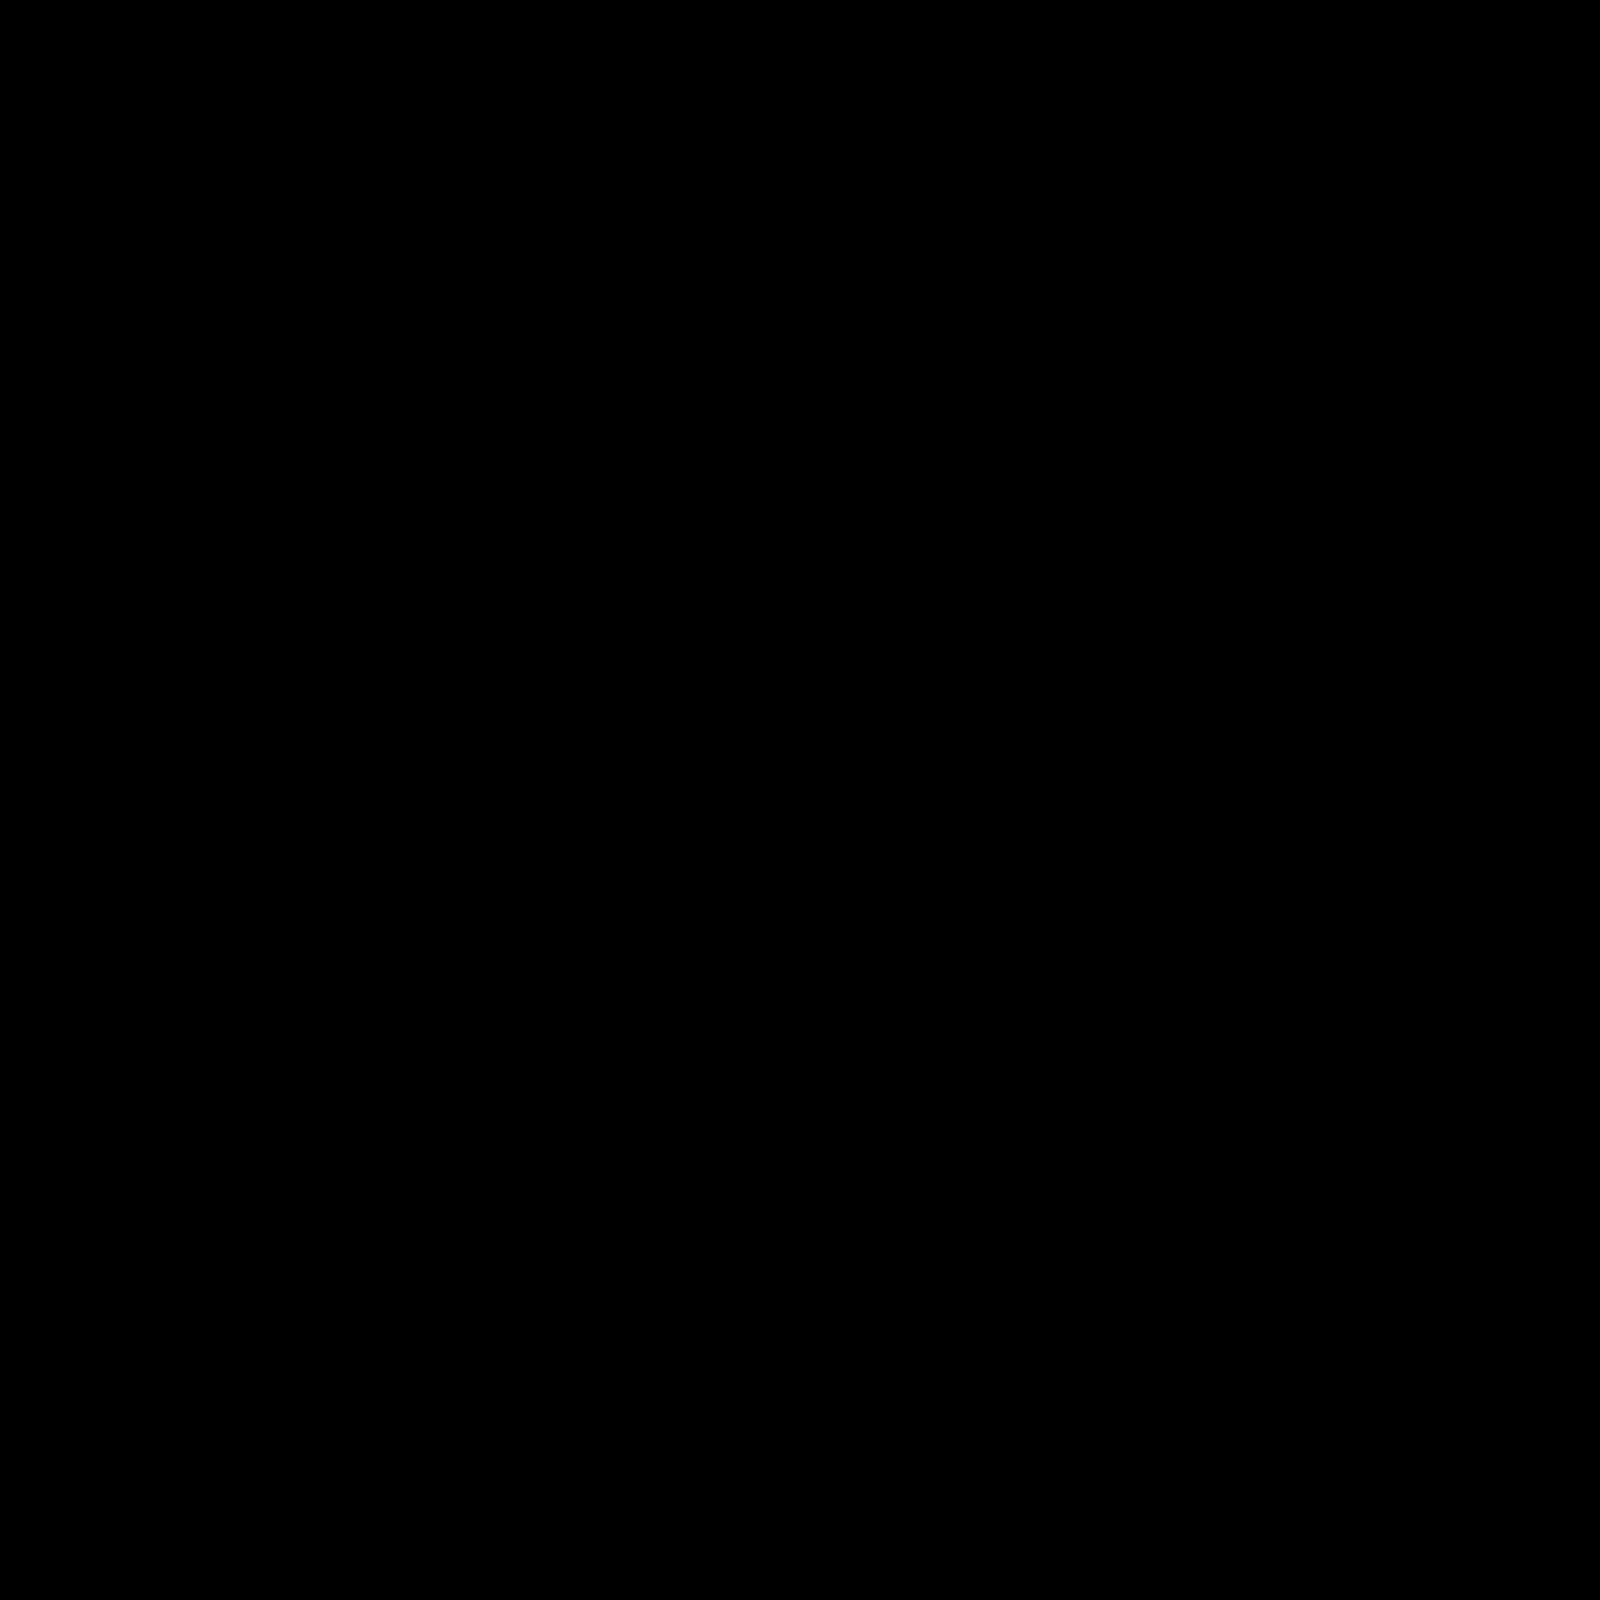 6 C w kółku icon